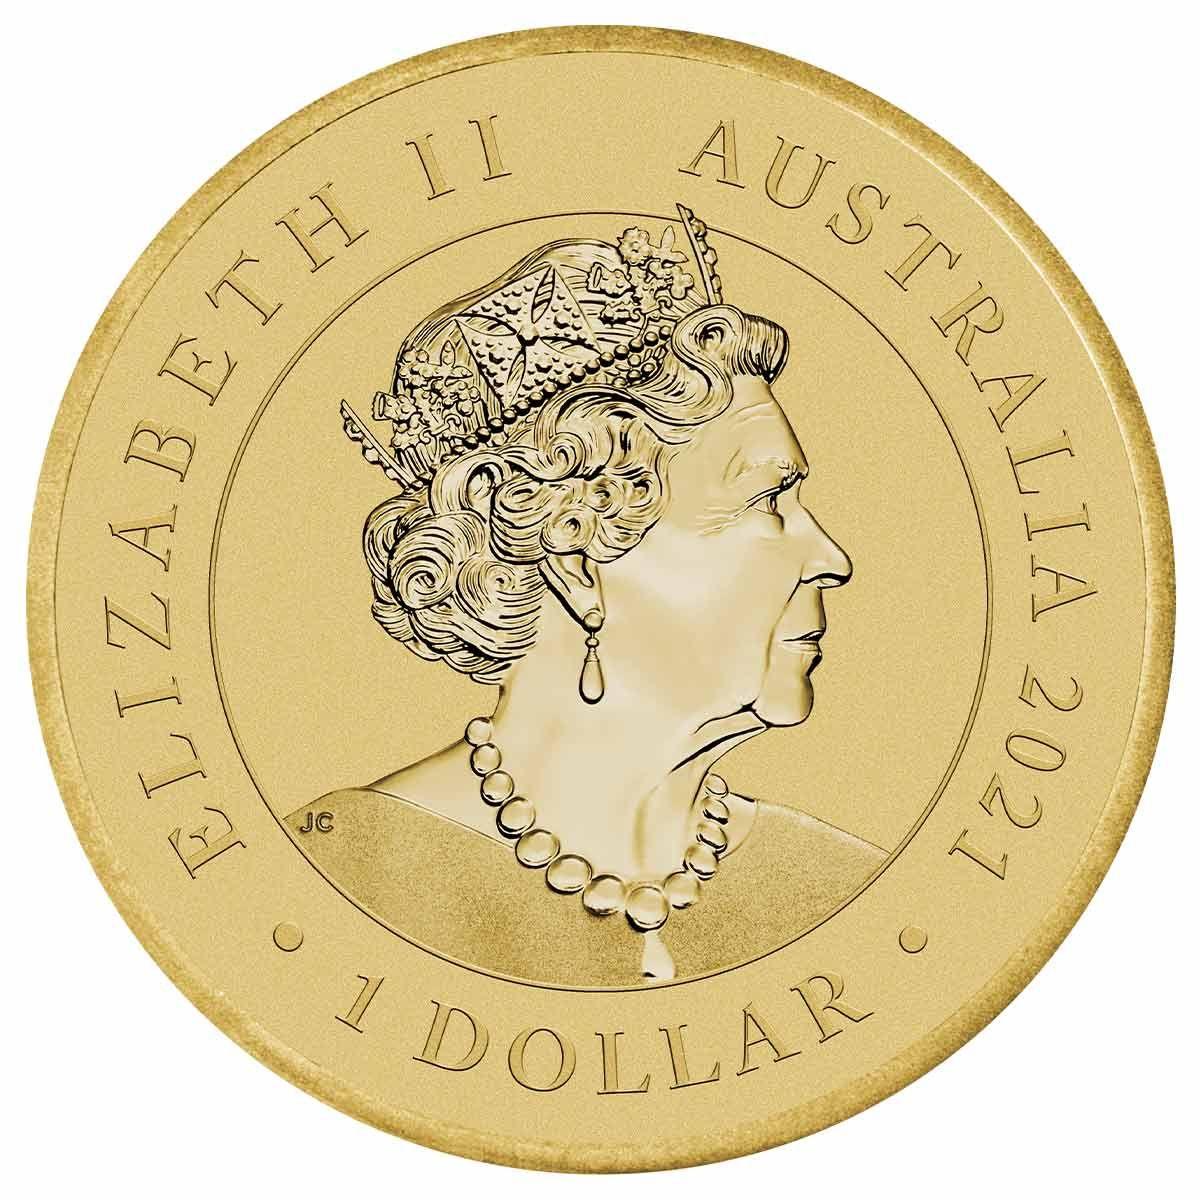 Австралия монета 1 доллар Рождественская монета, аверс